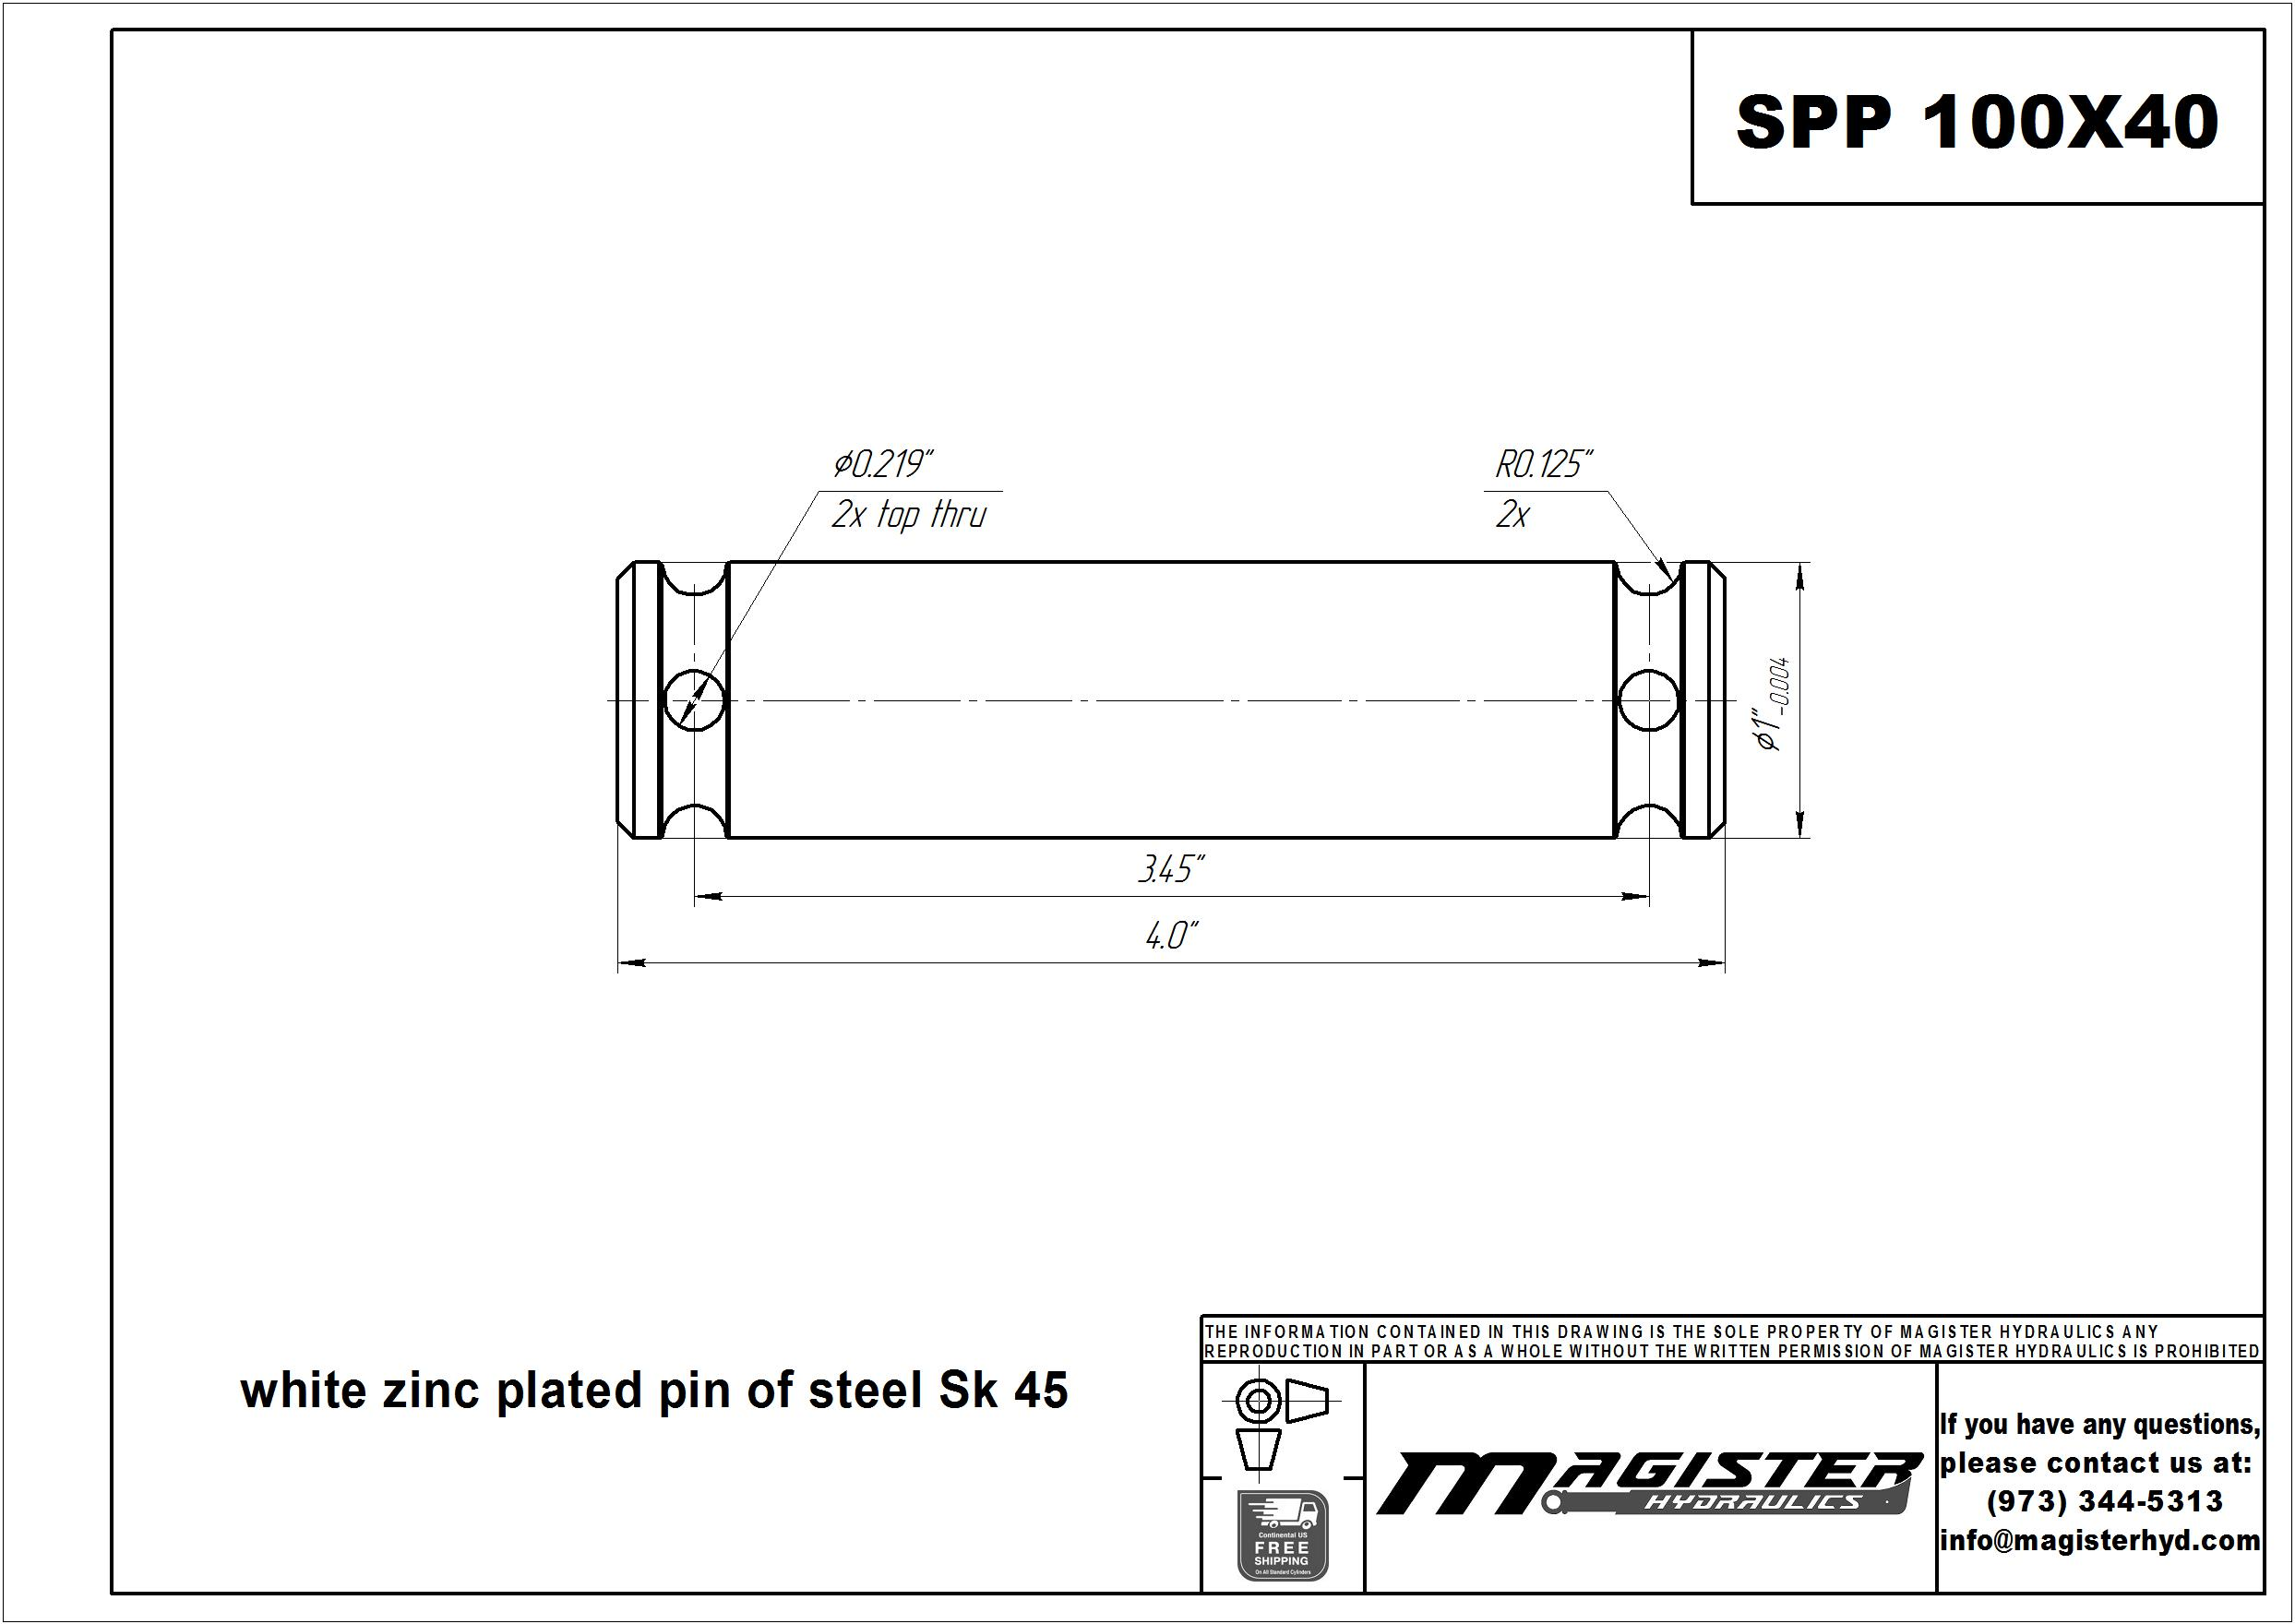 1 pin diameter x 4 long steel pivot pin for hydraulic cylinder